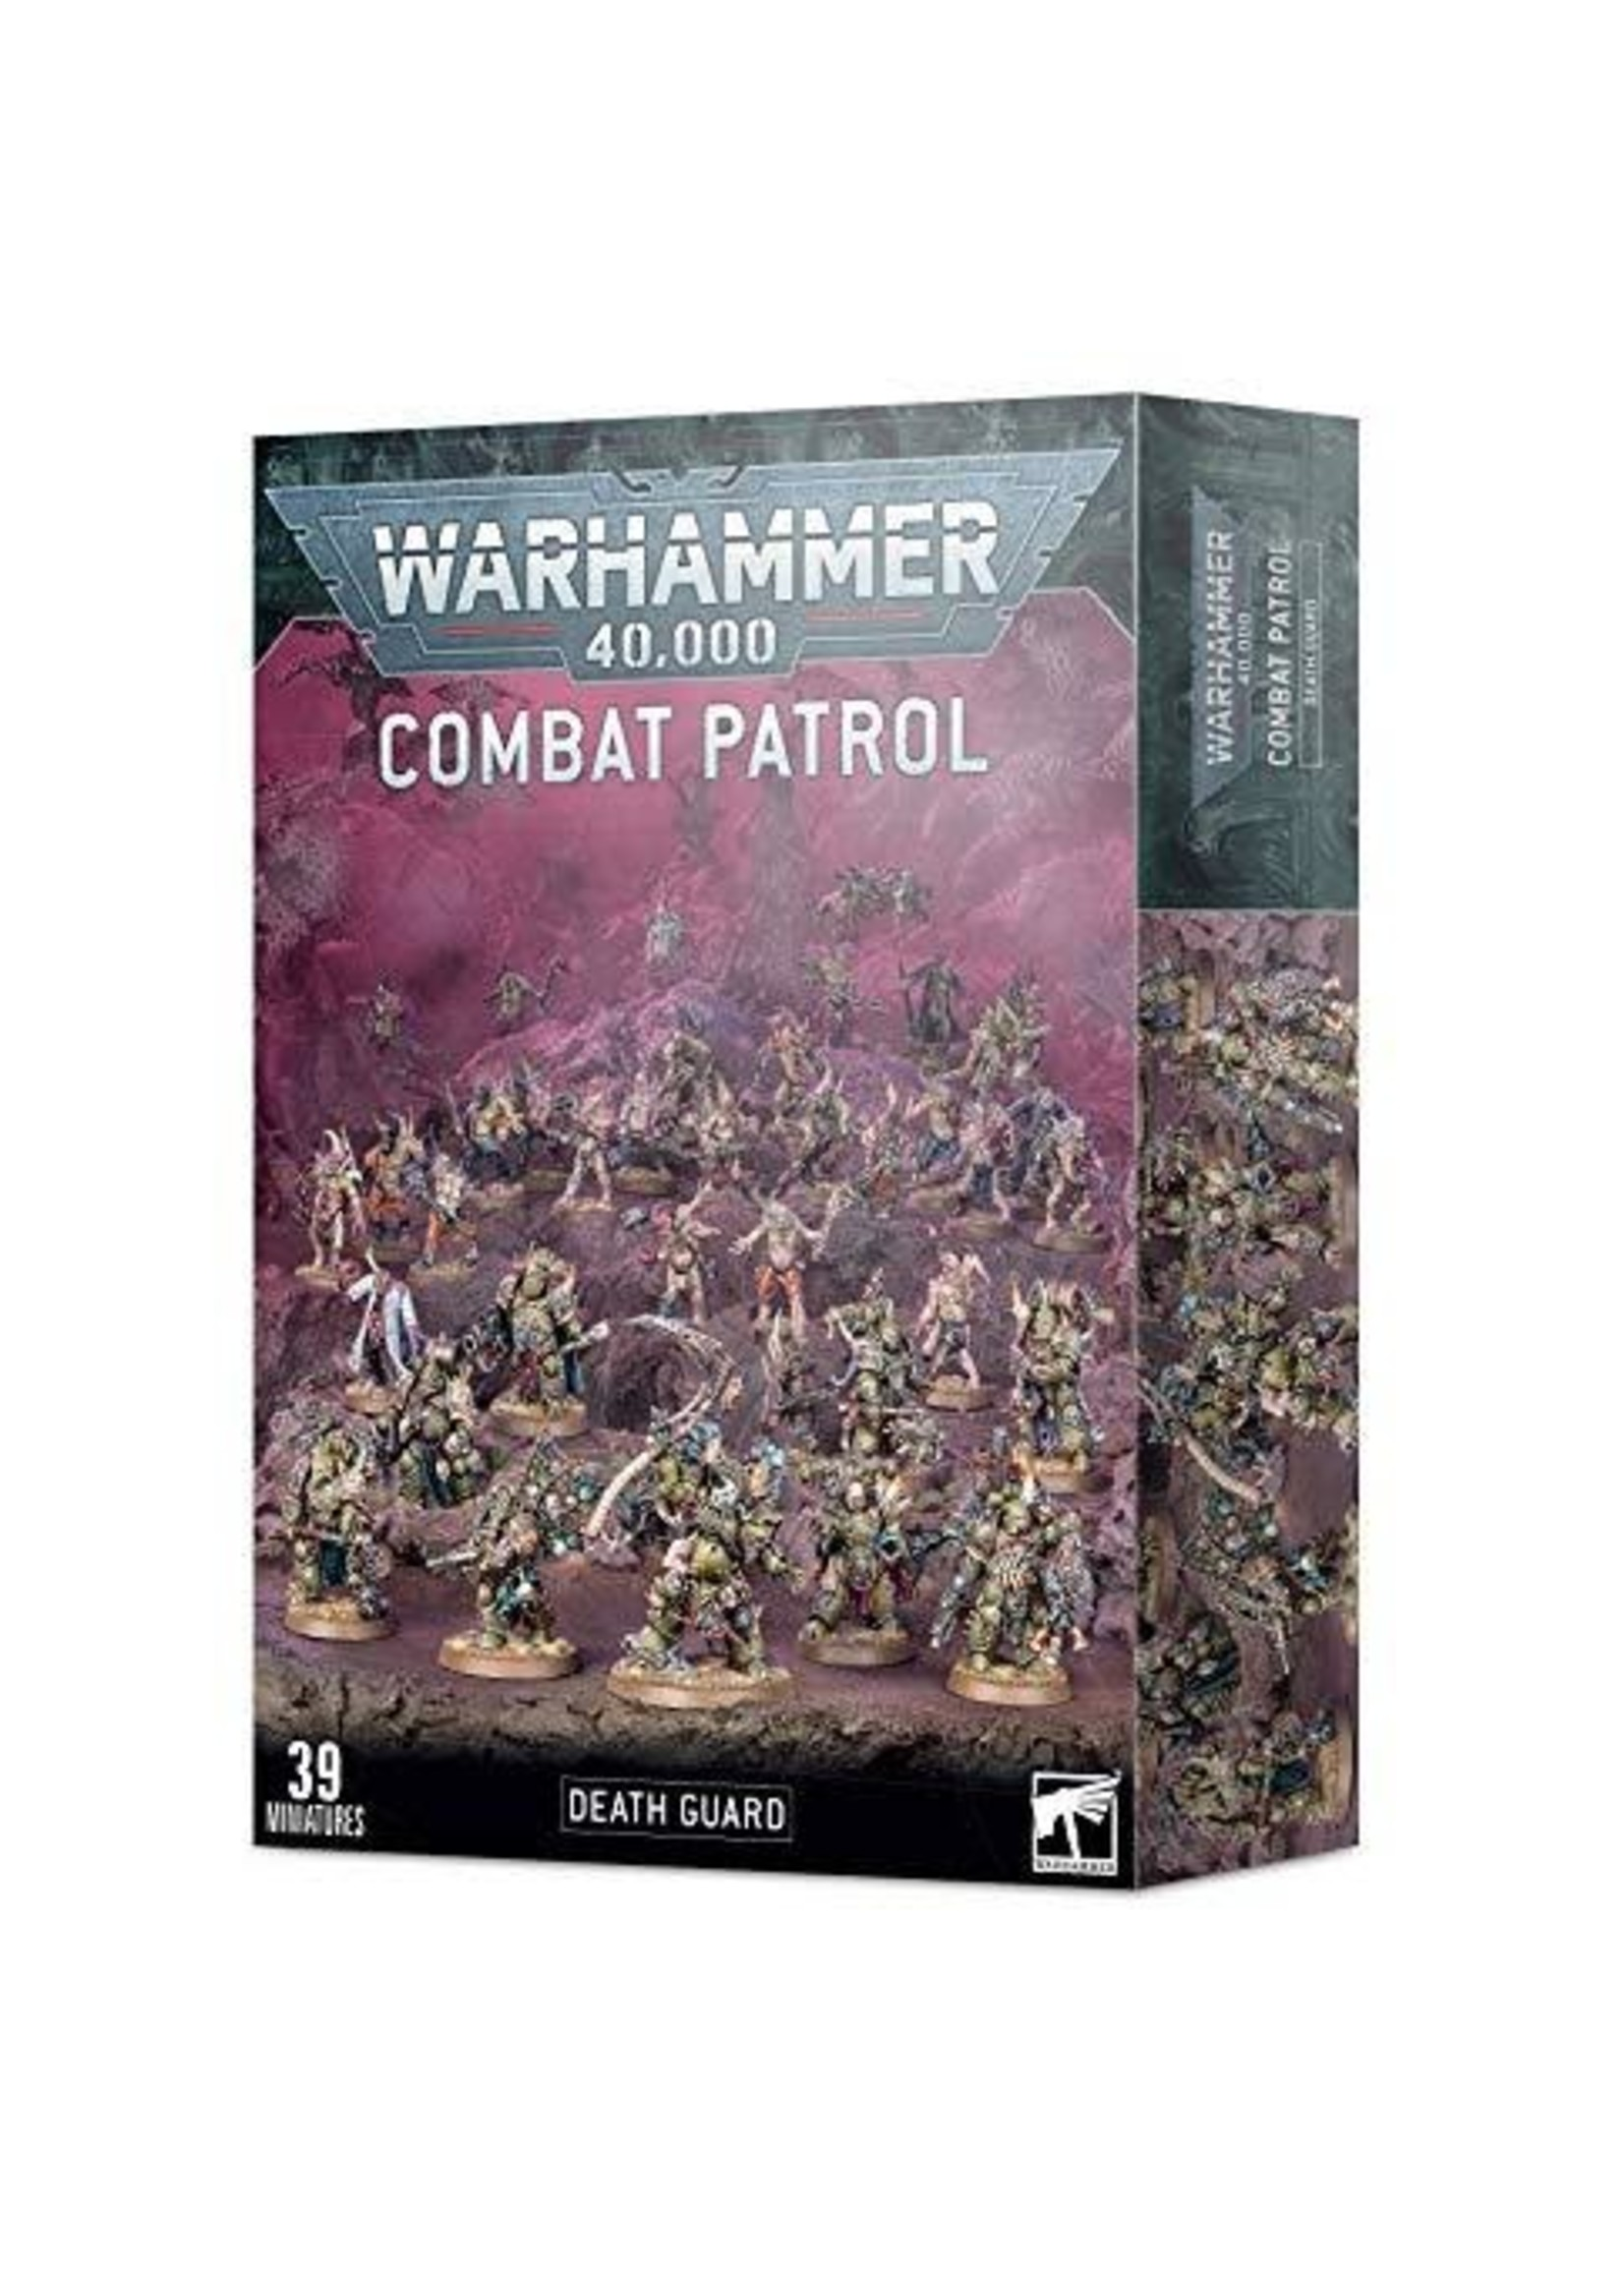 Warhammer: 40K Combat Patrol Death Guard